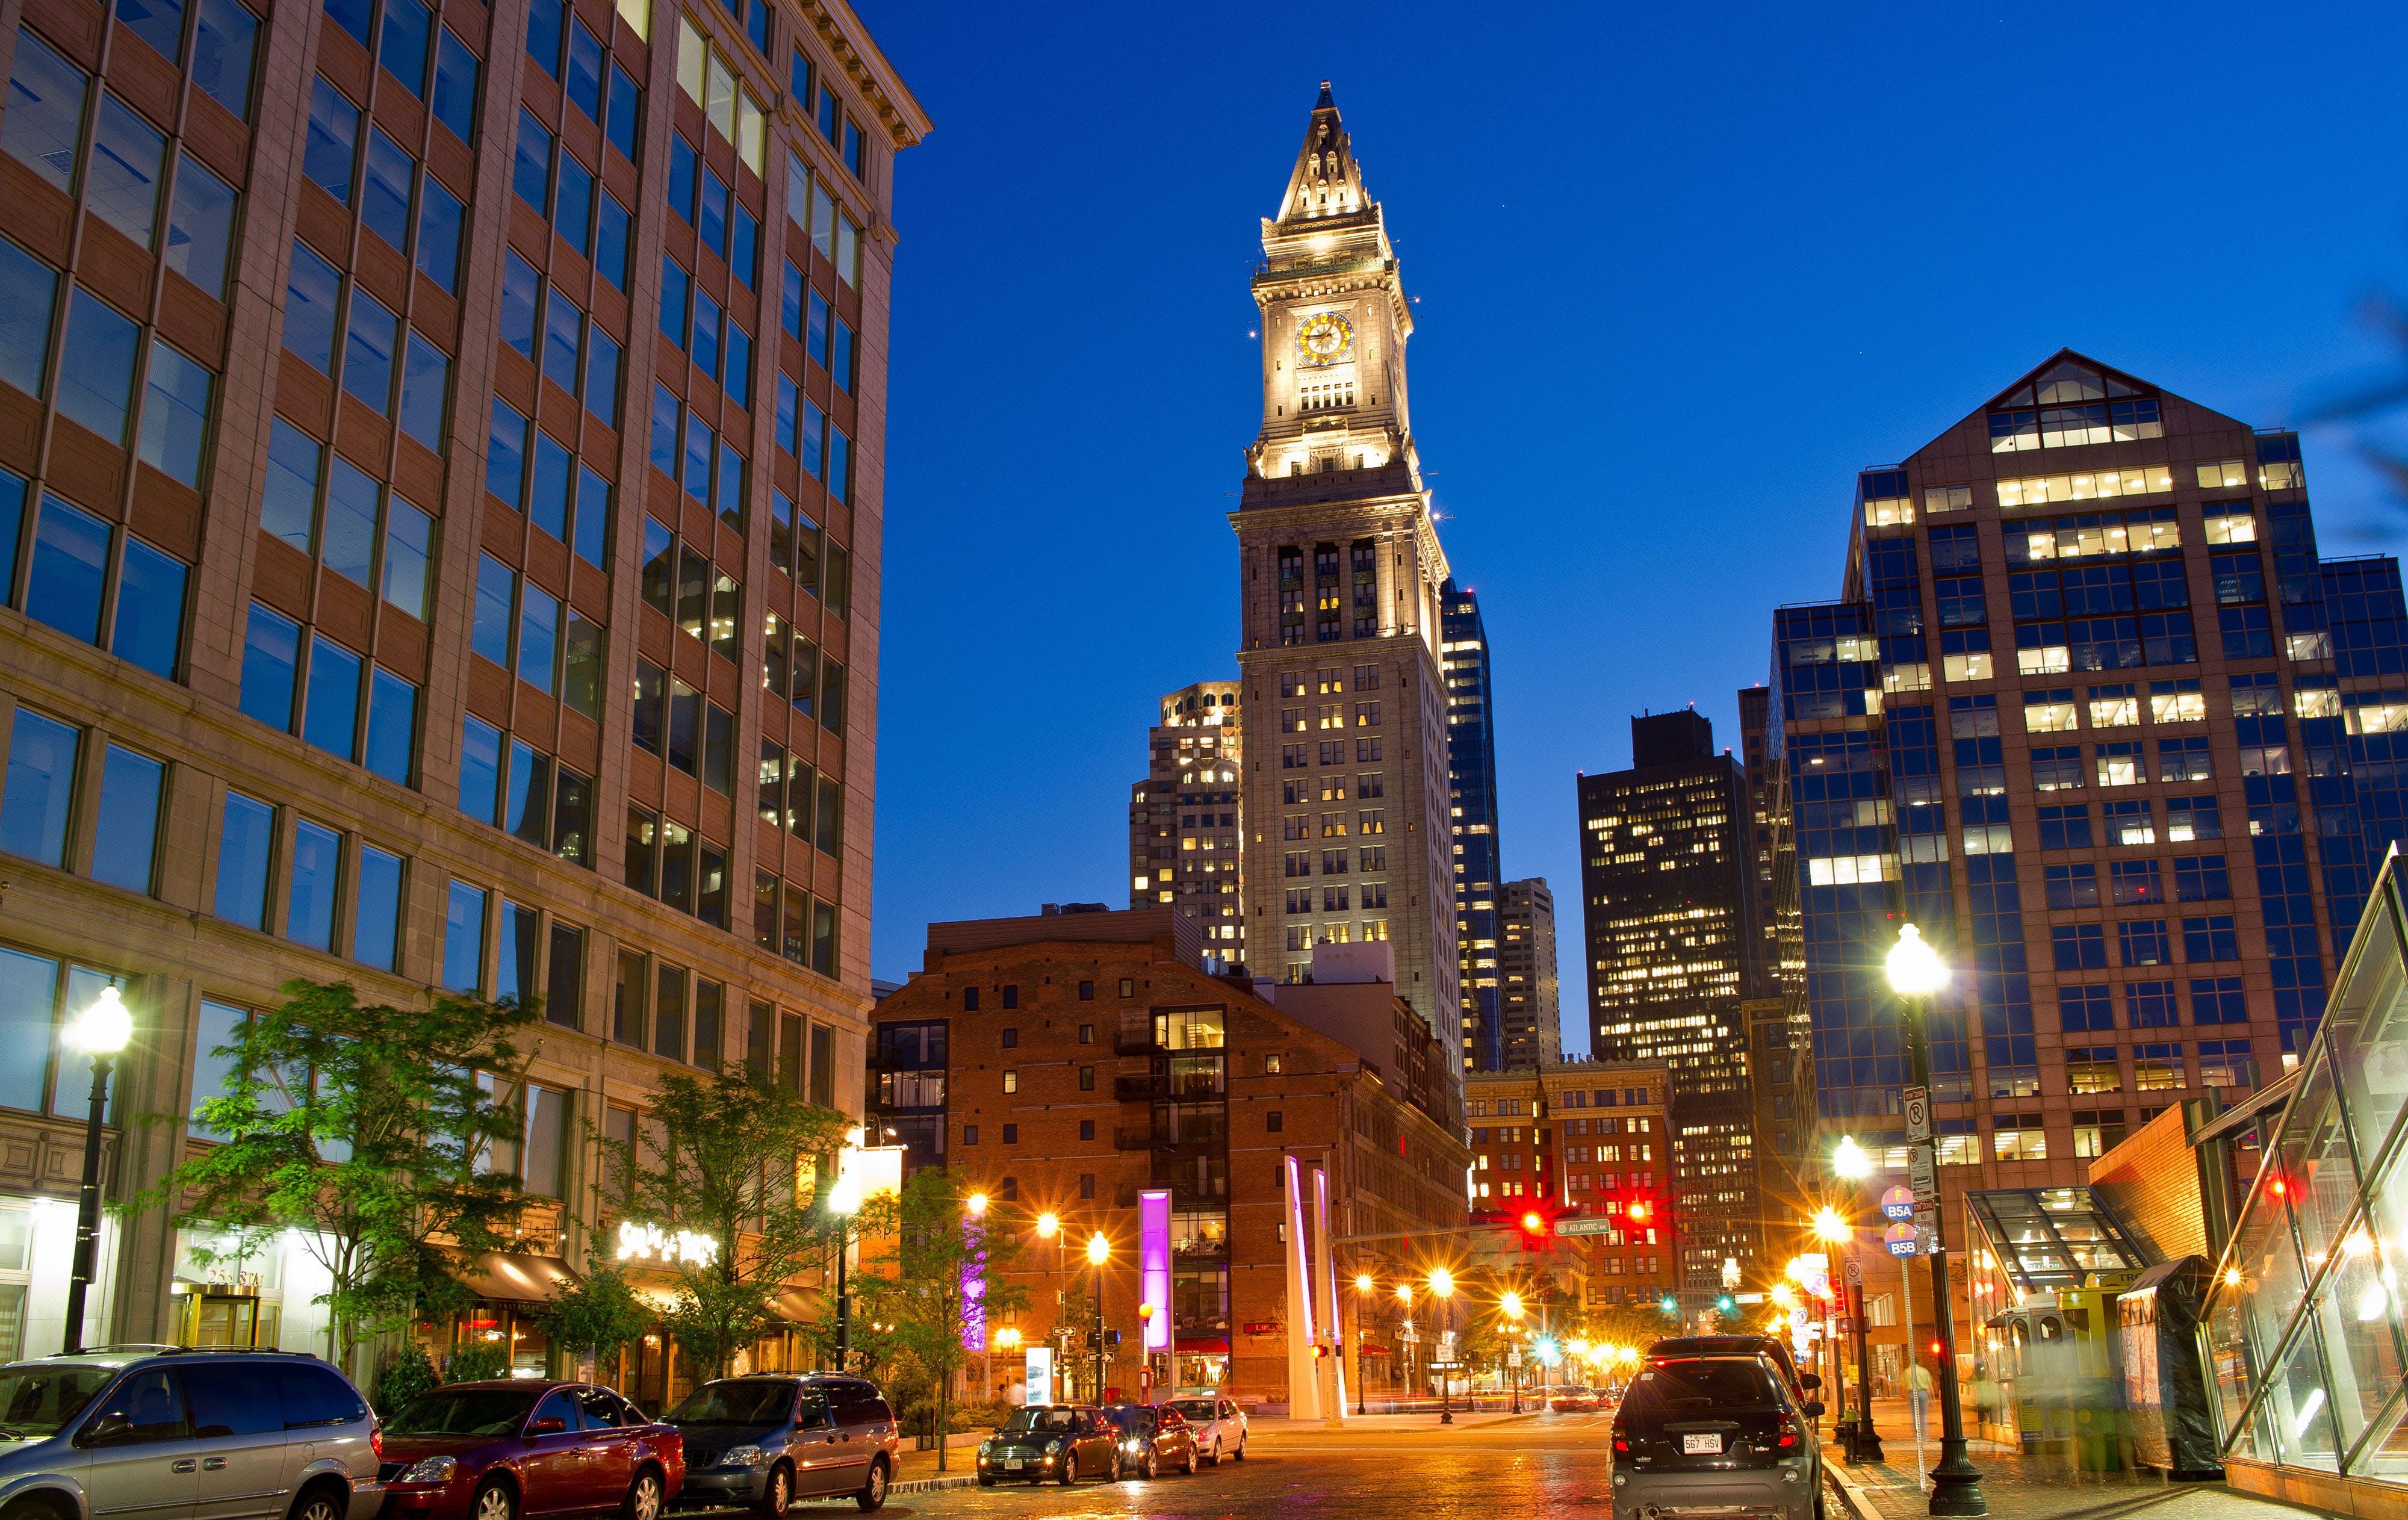 Boston_Custom_House_Tower_at_Night